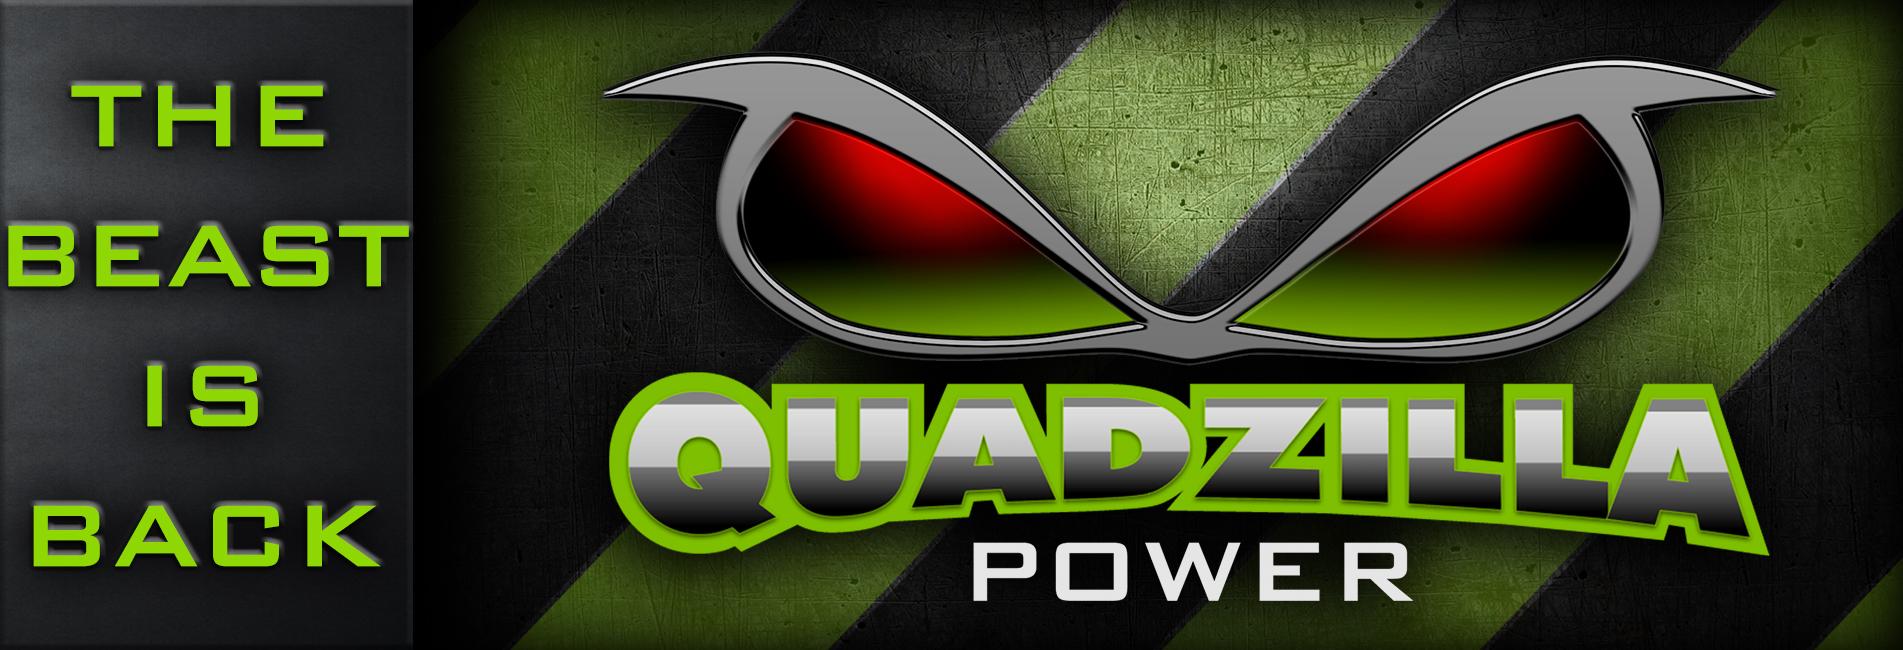 main_banner__42525?t=1503436778 quadzilla quadzilla adrenaline wiring diagram at soozxer.org